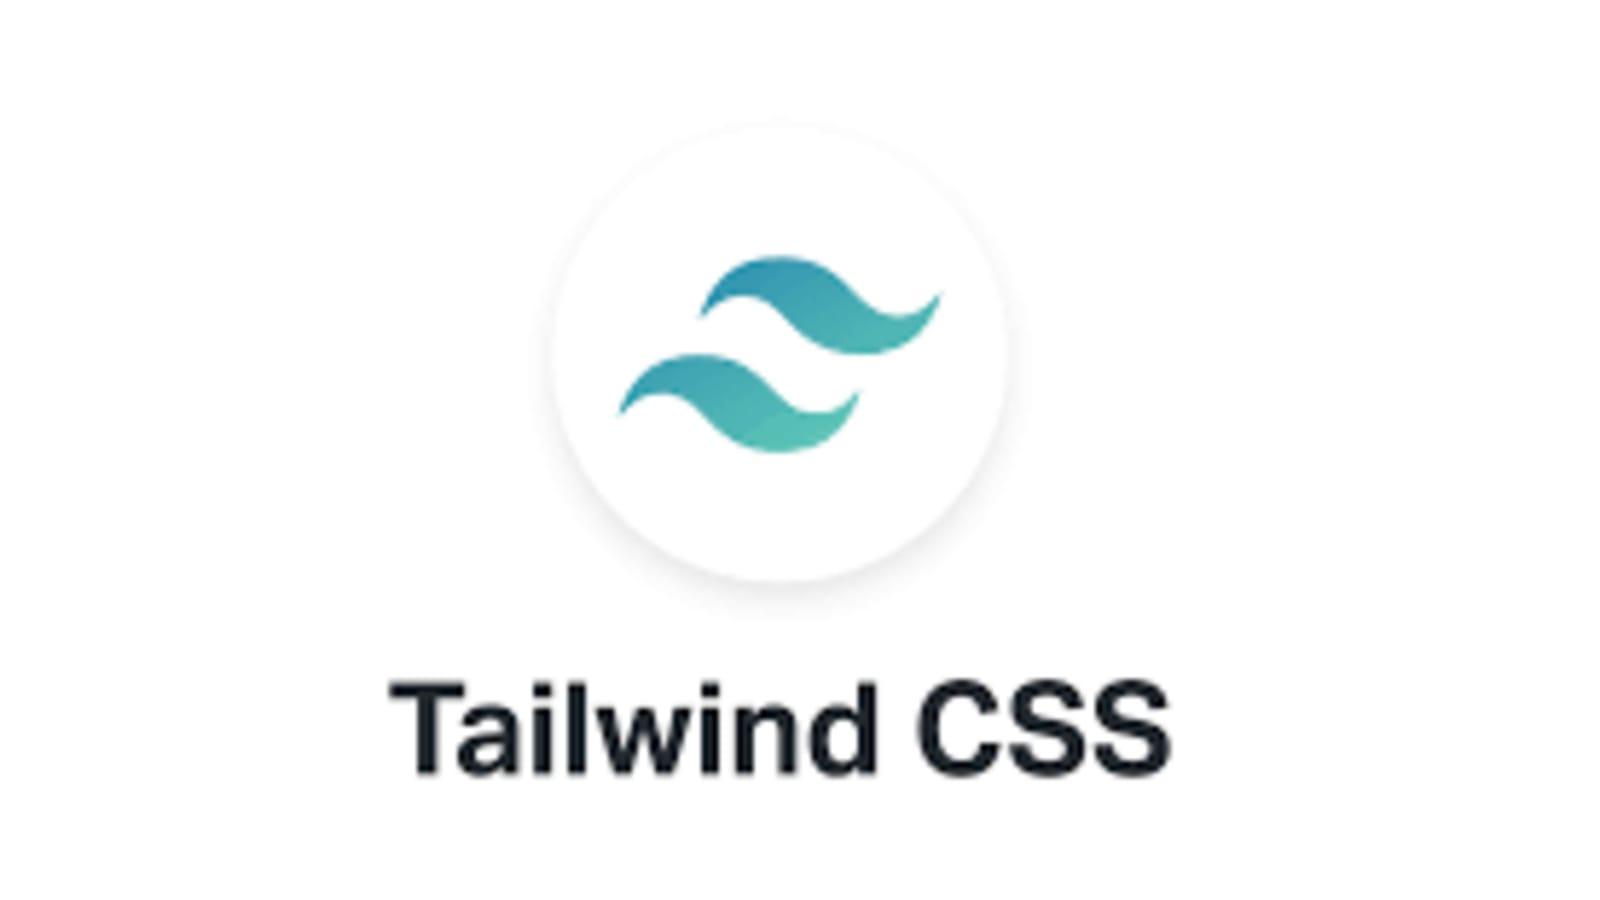 Tailwind Css ????